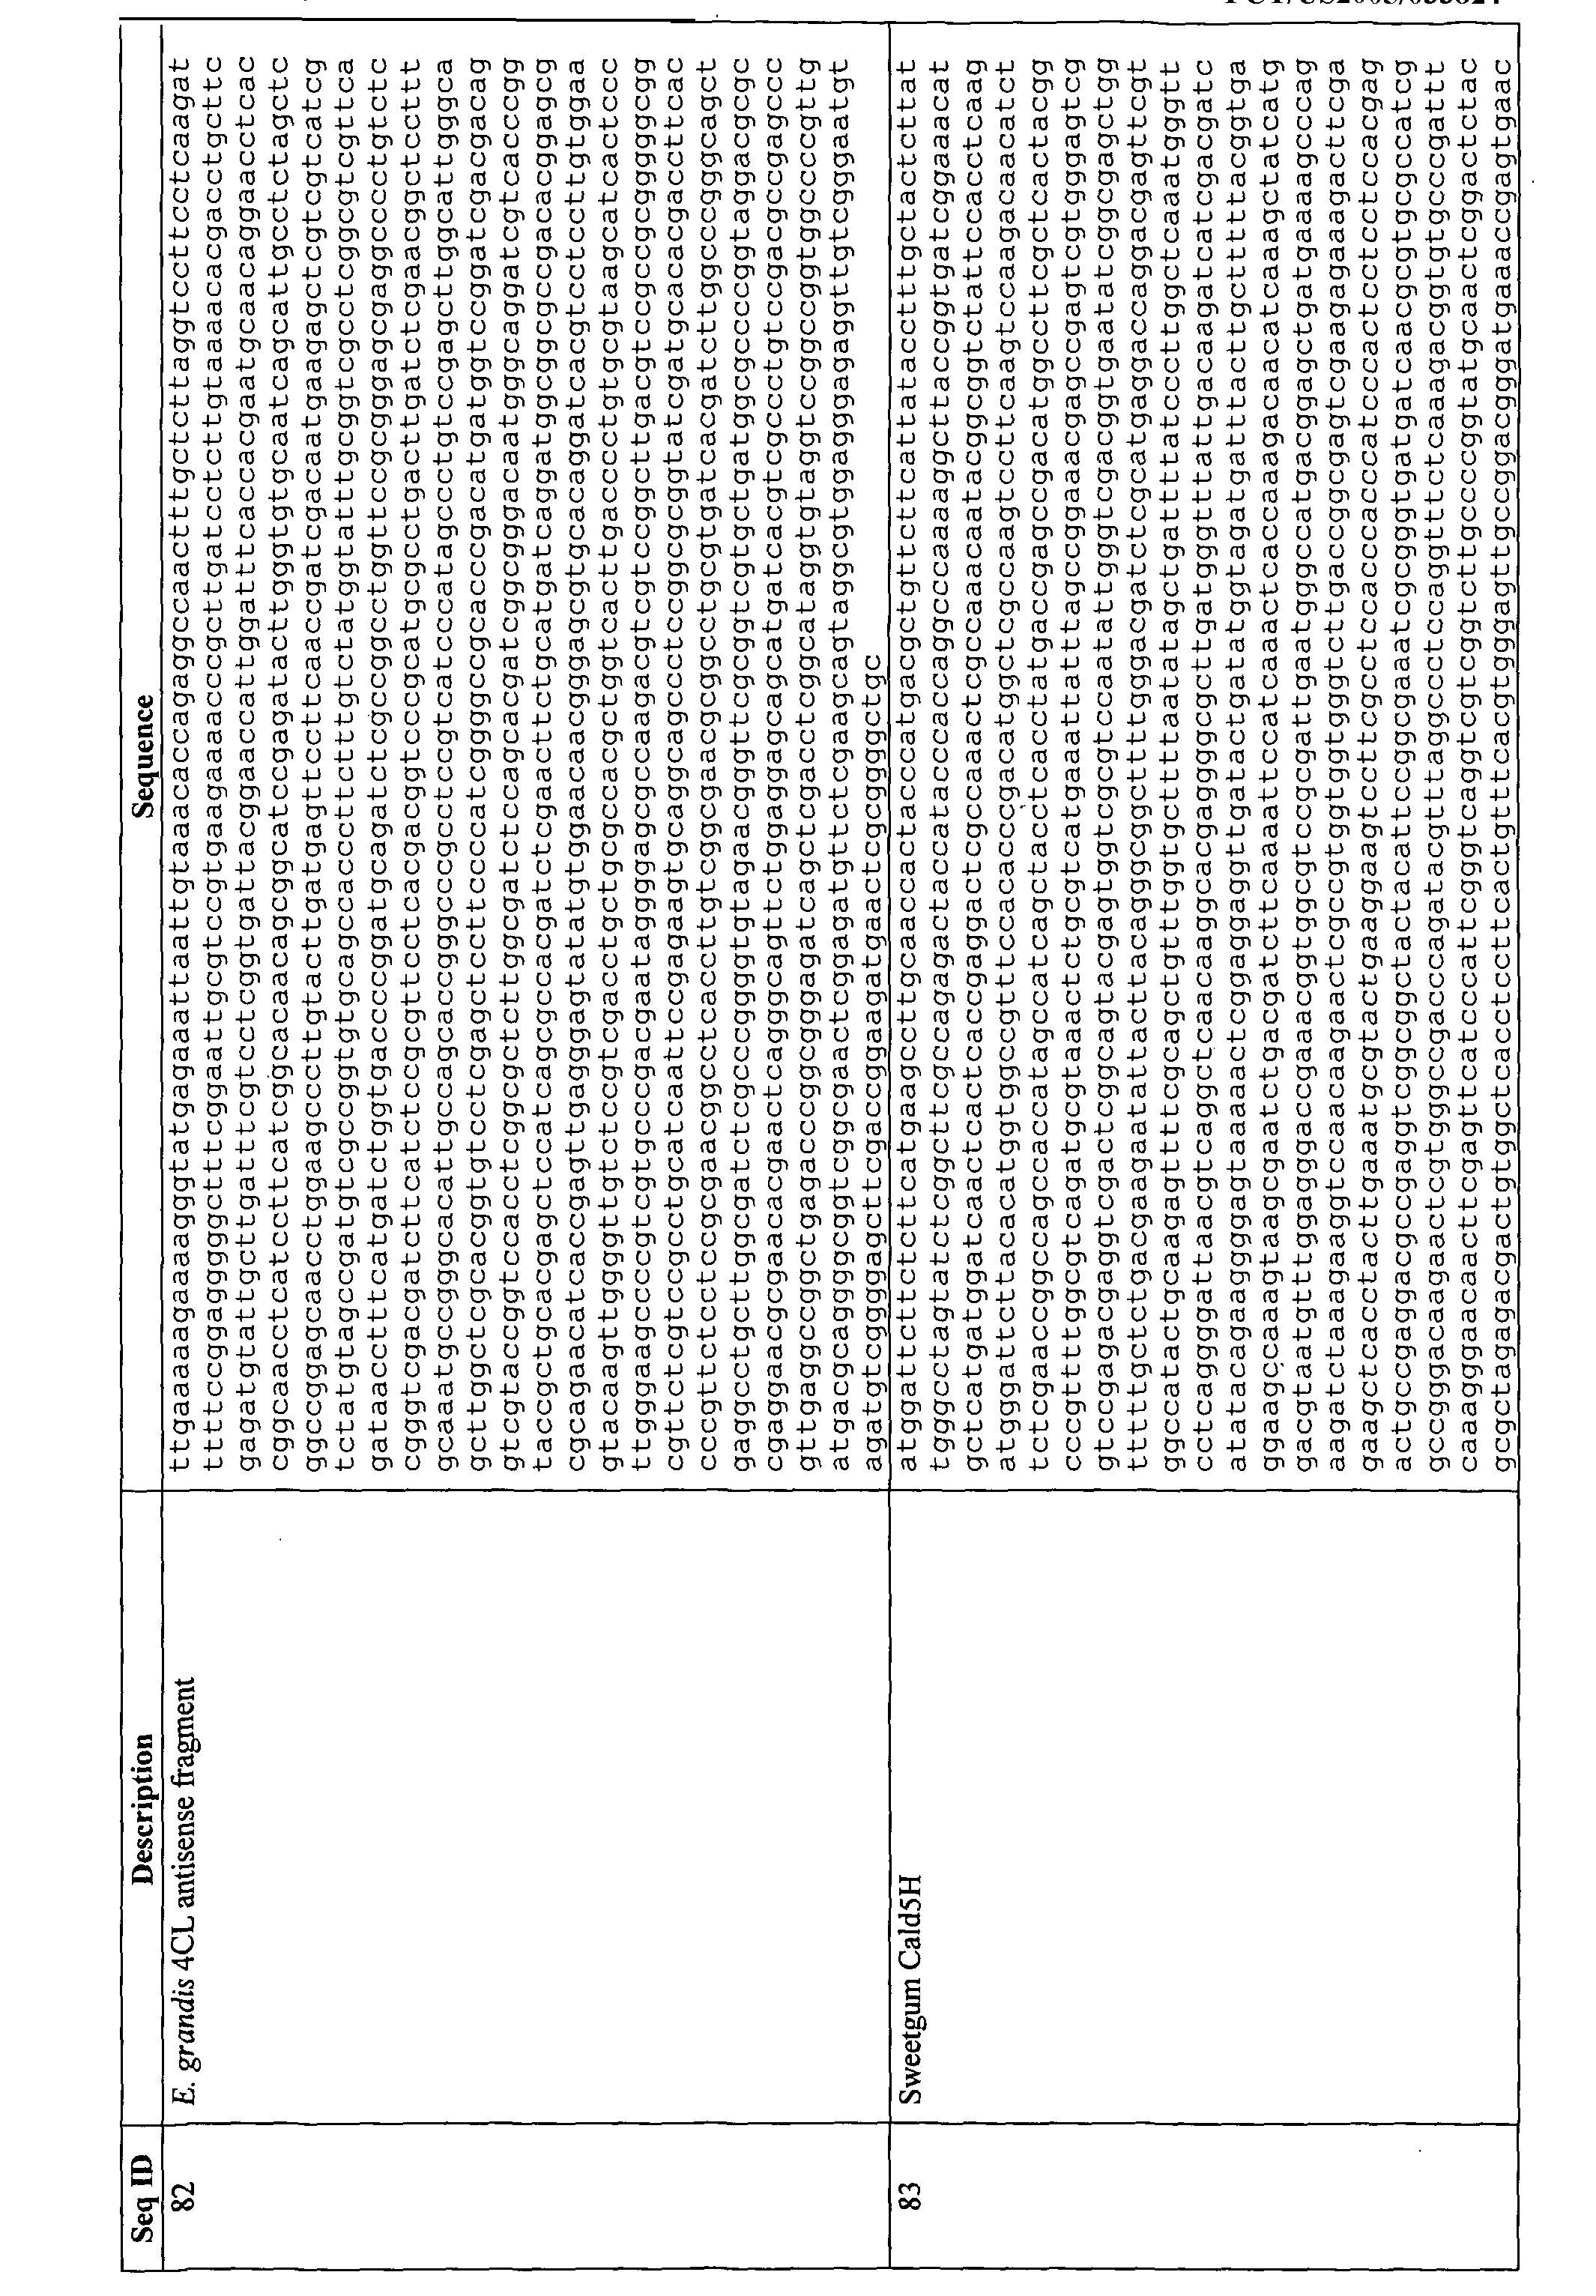 Patent Wo2006036698a2 Modification Of Plant Lignin